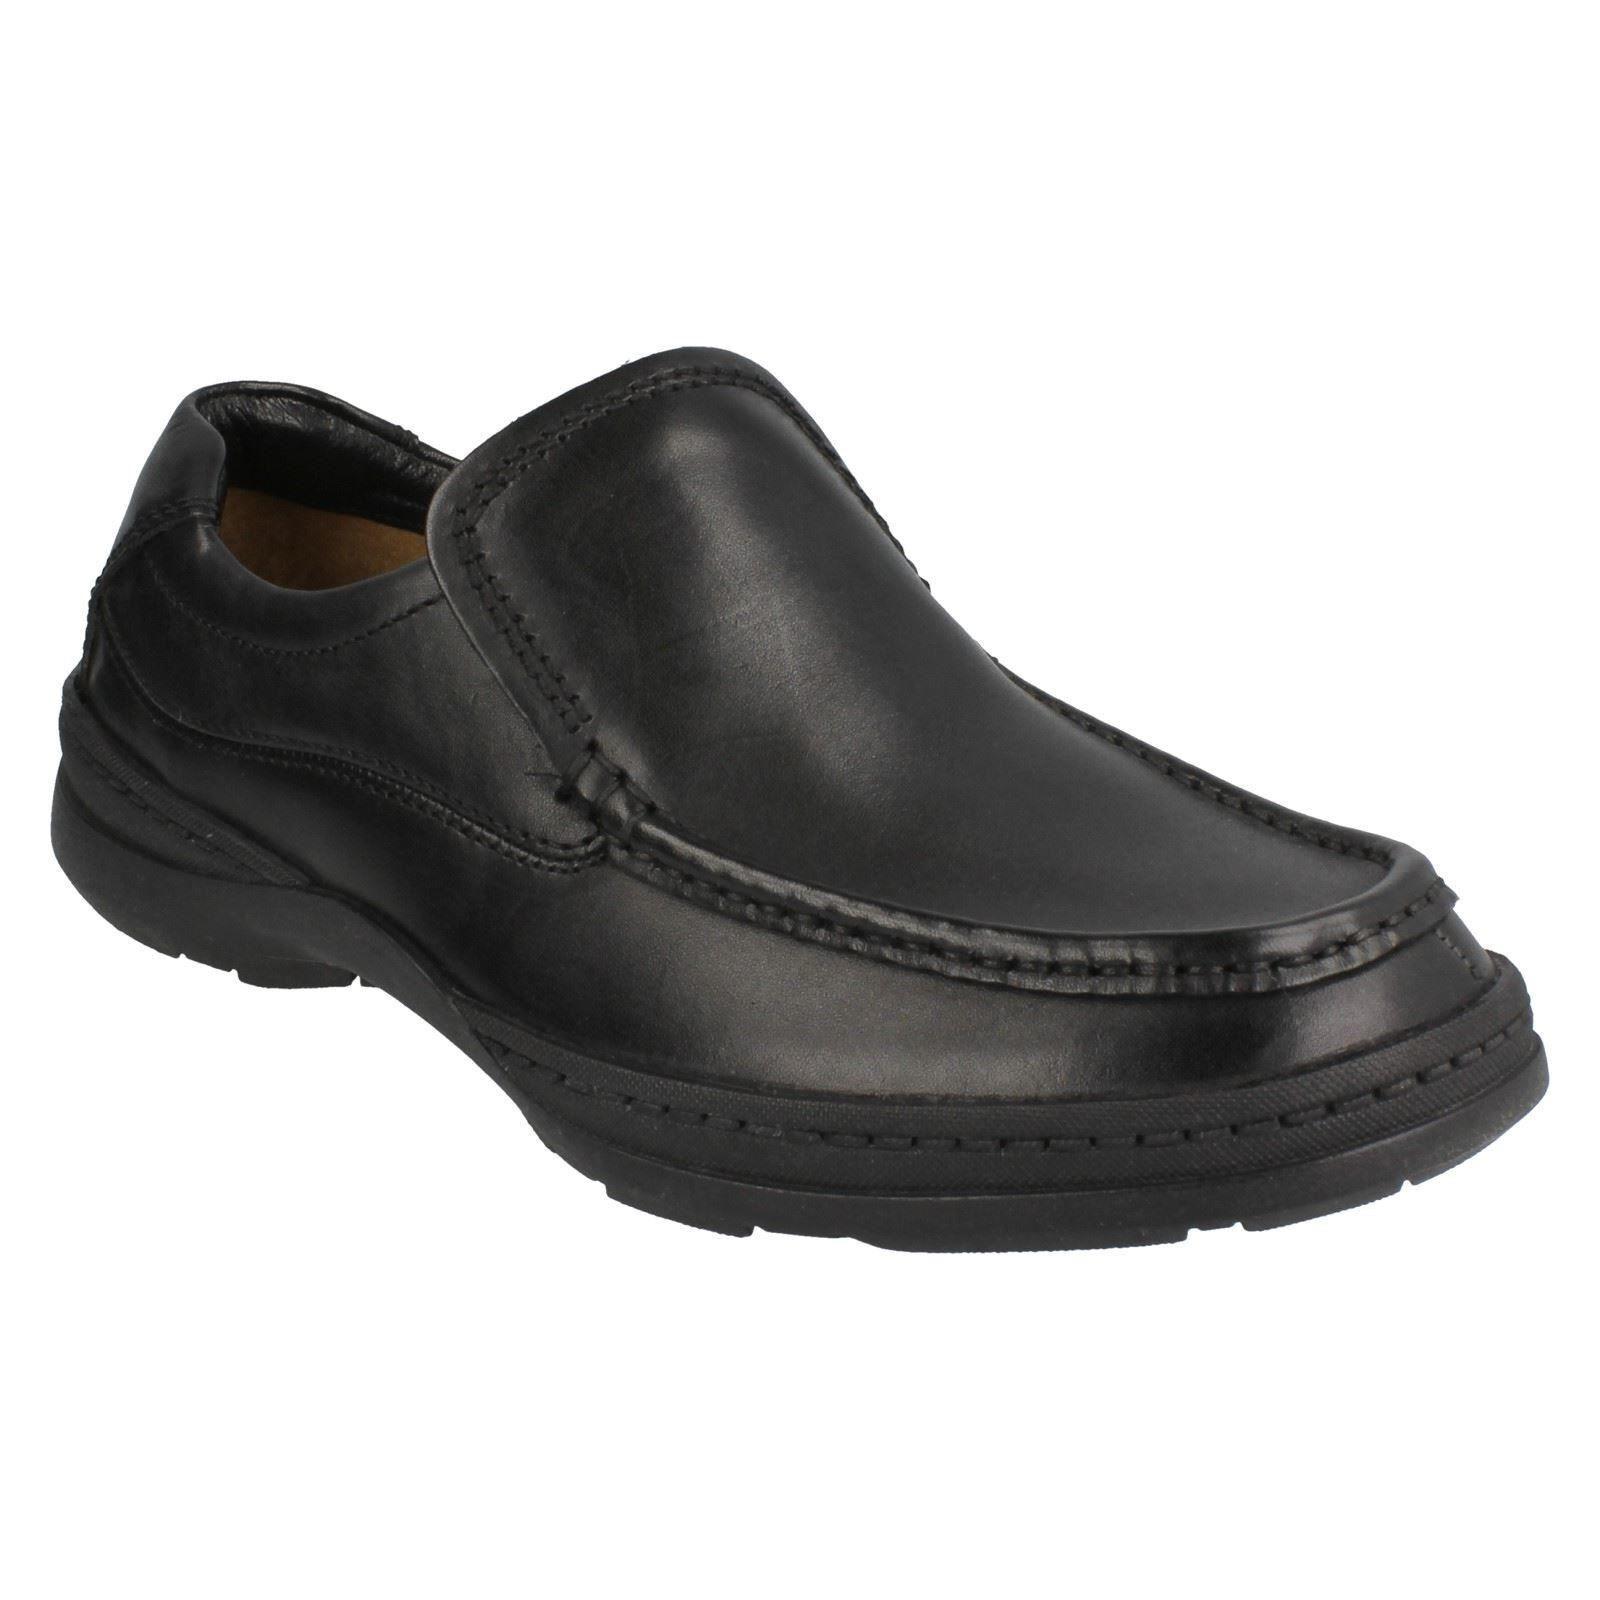 SALE Clarks 'Line Shoes Stride' Mens Black Leather Slip On Shoes 'Line H Fit c2e809